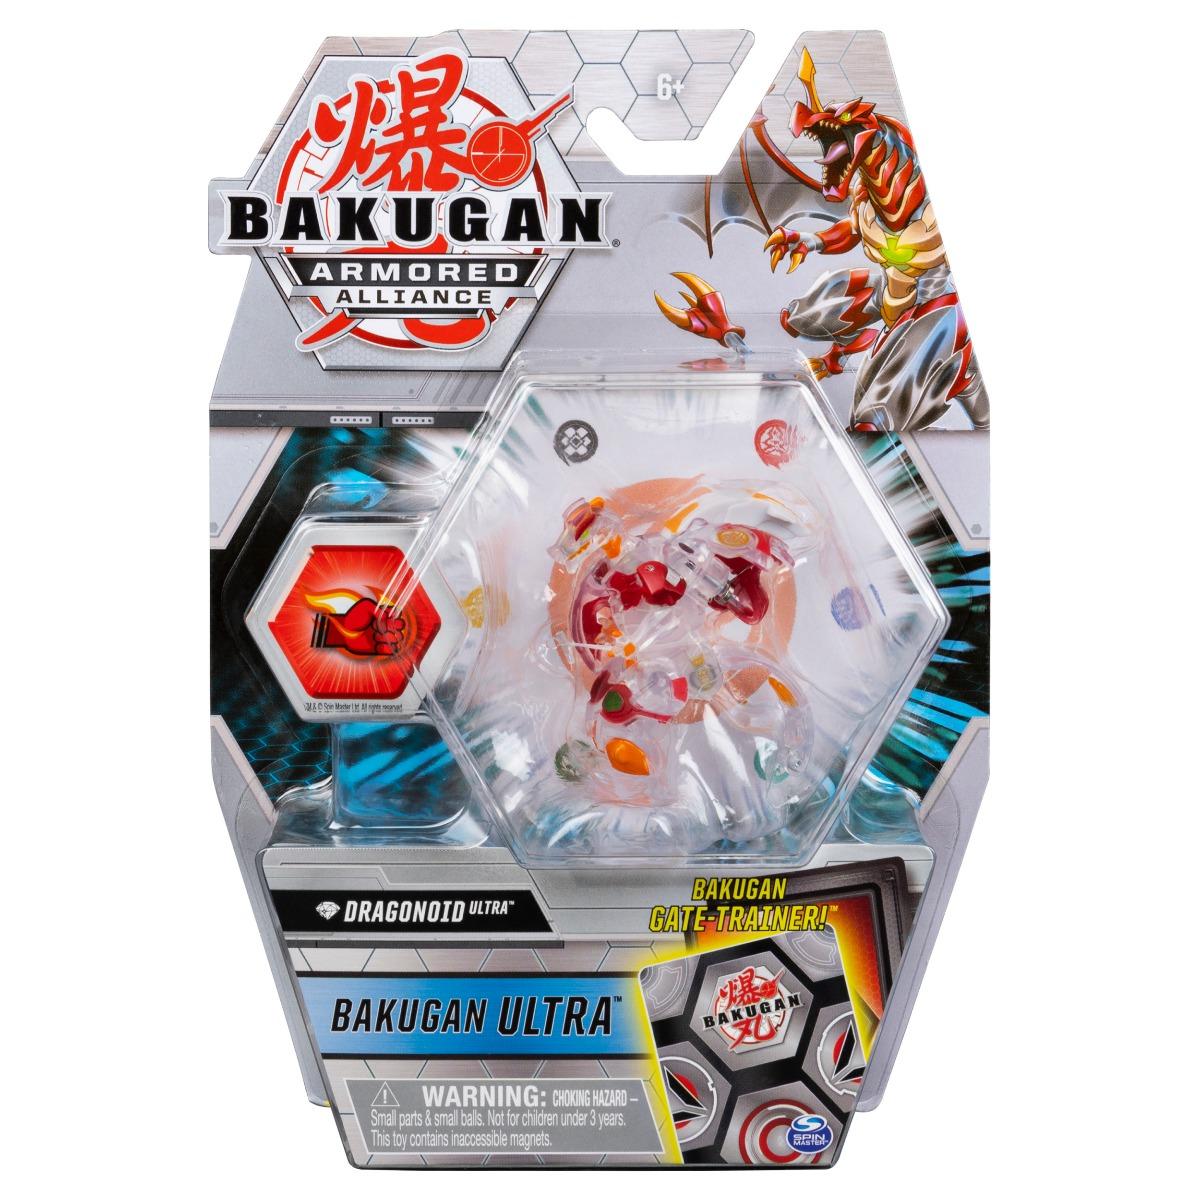 Figurina Bakugan Ultra Armored Alliance, Diamond Dragonoid, 20124299